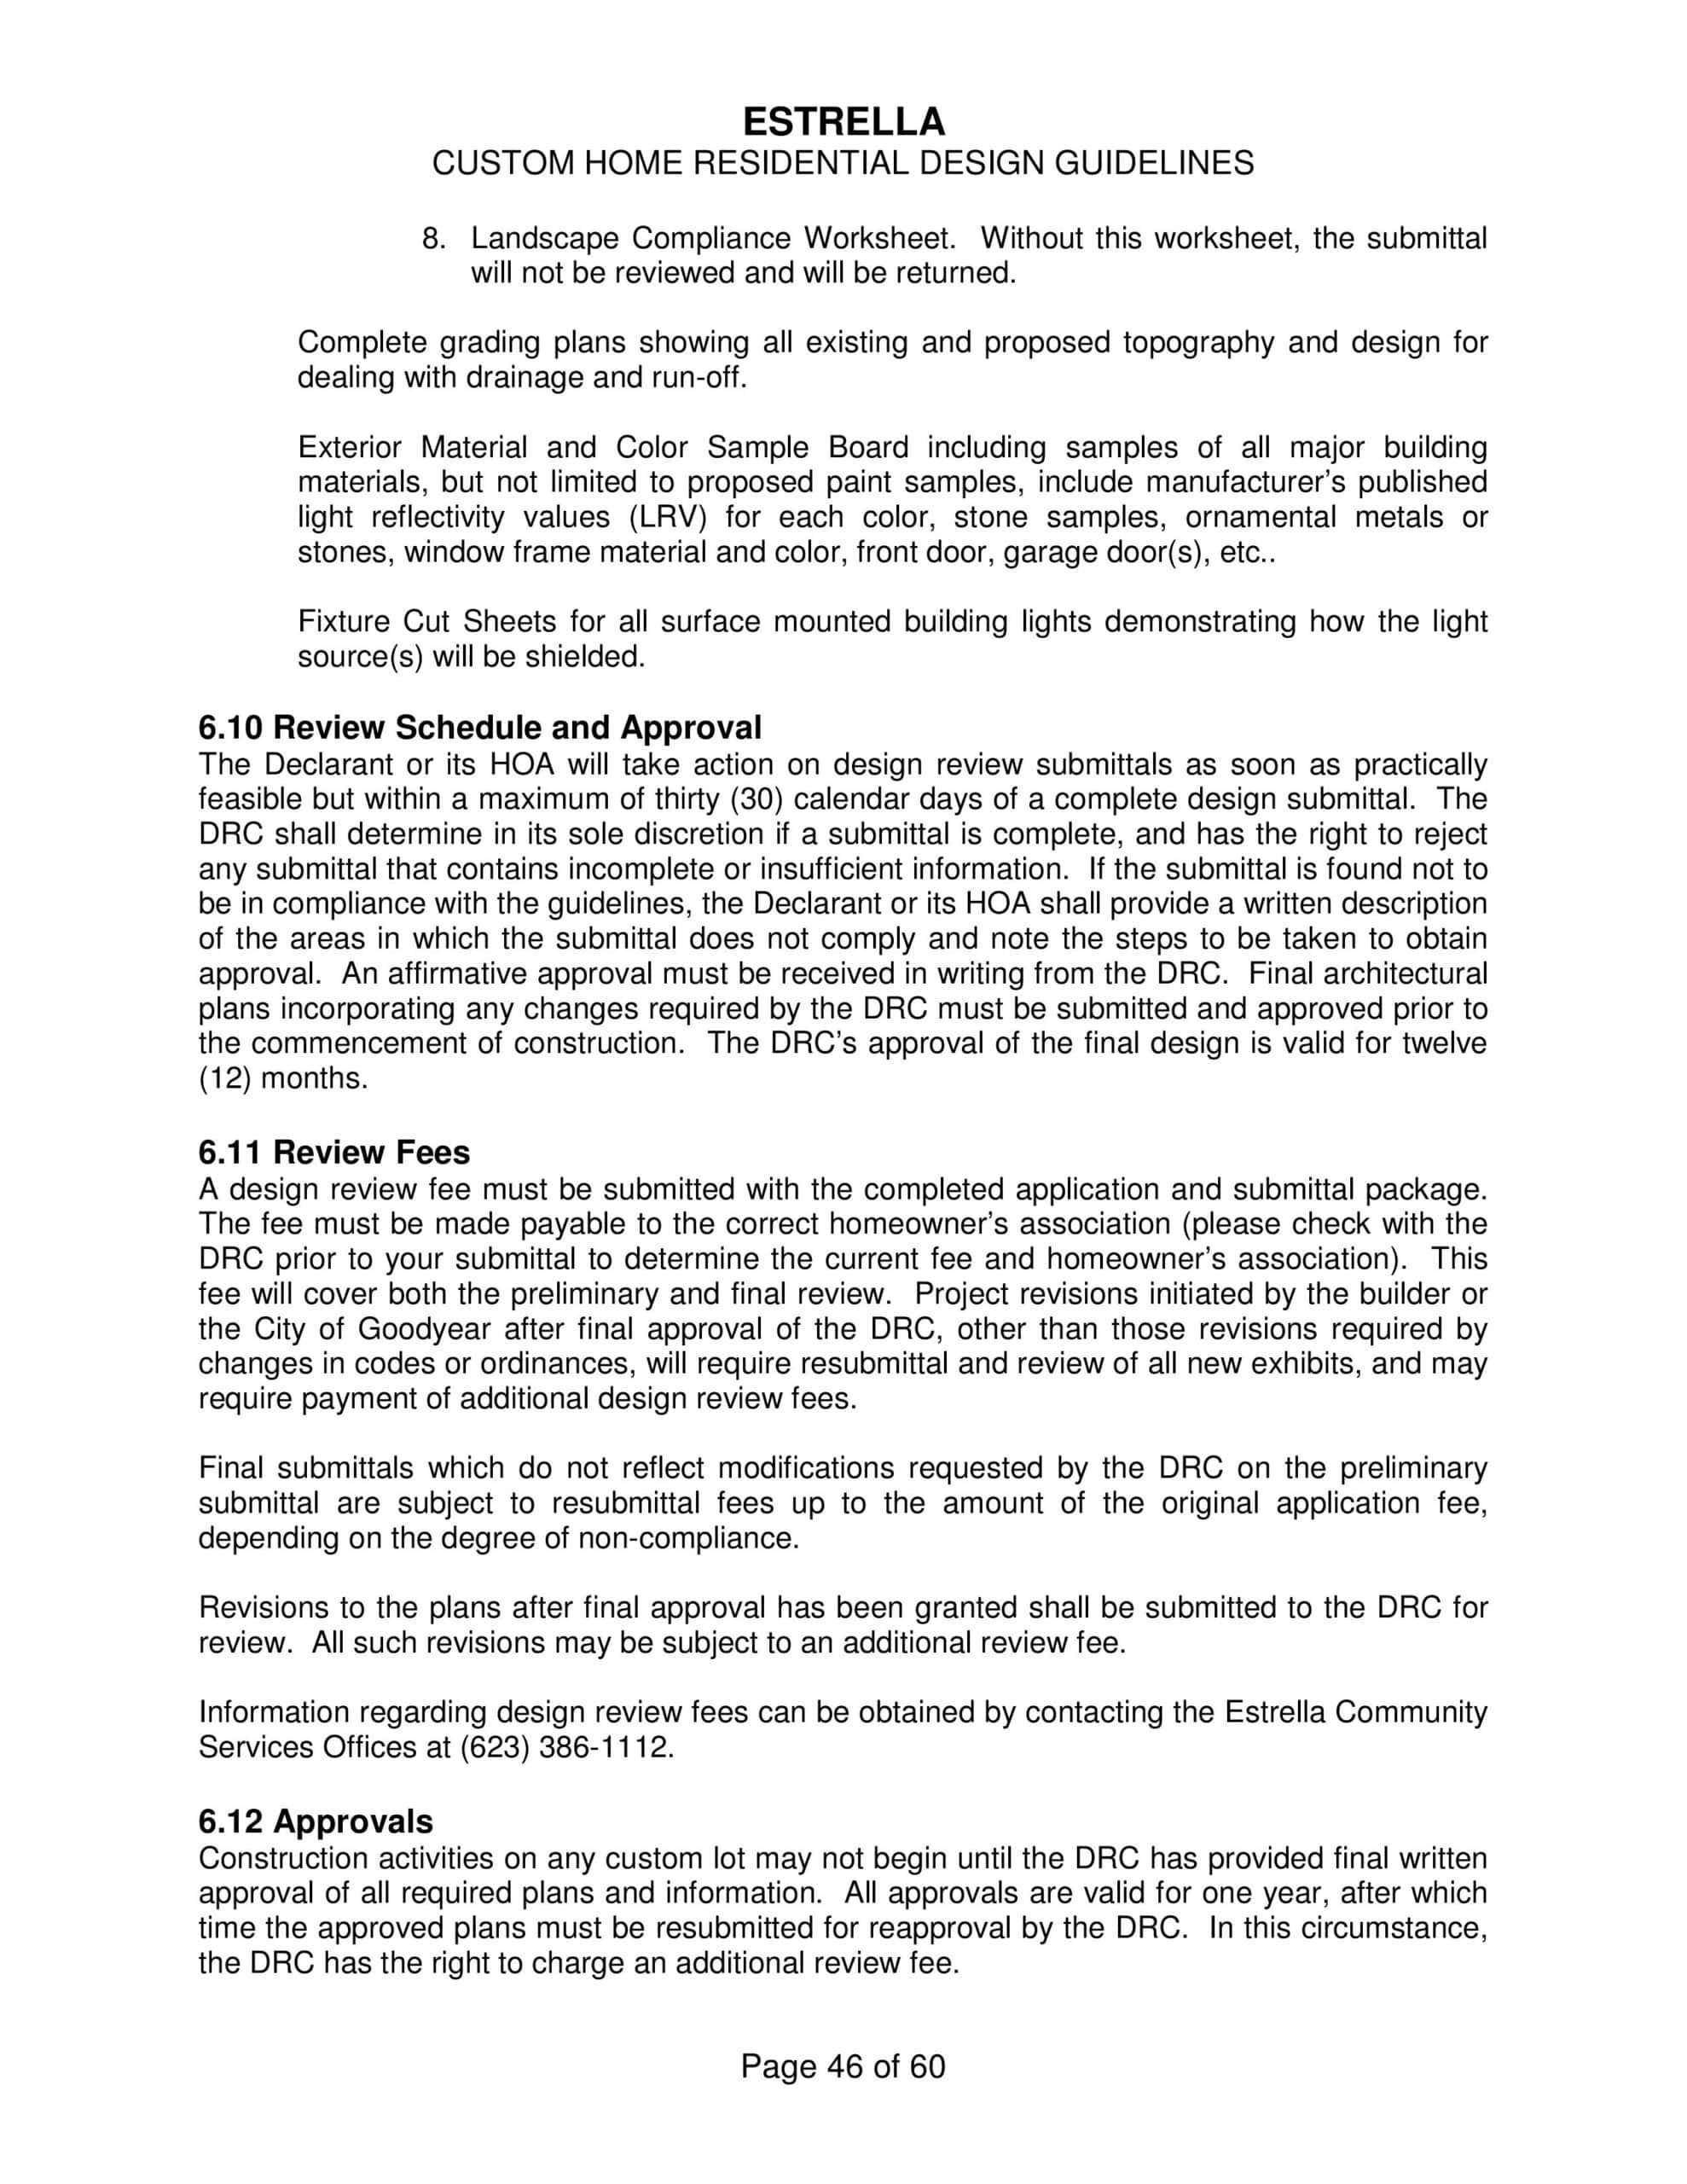 ESTRELLA MOUNTAIN CUSTOM HOME GUIDELINES-page-050